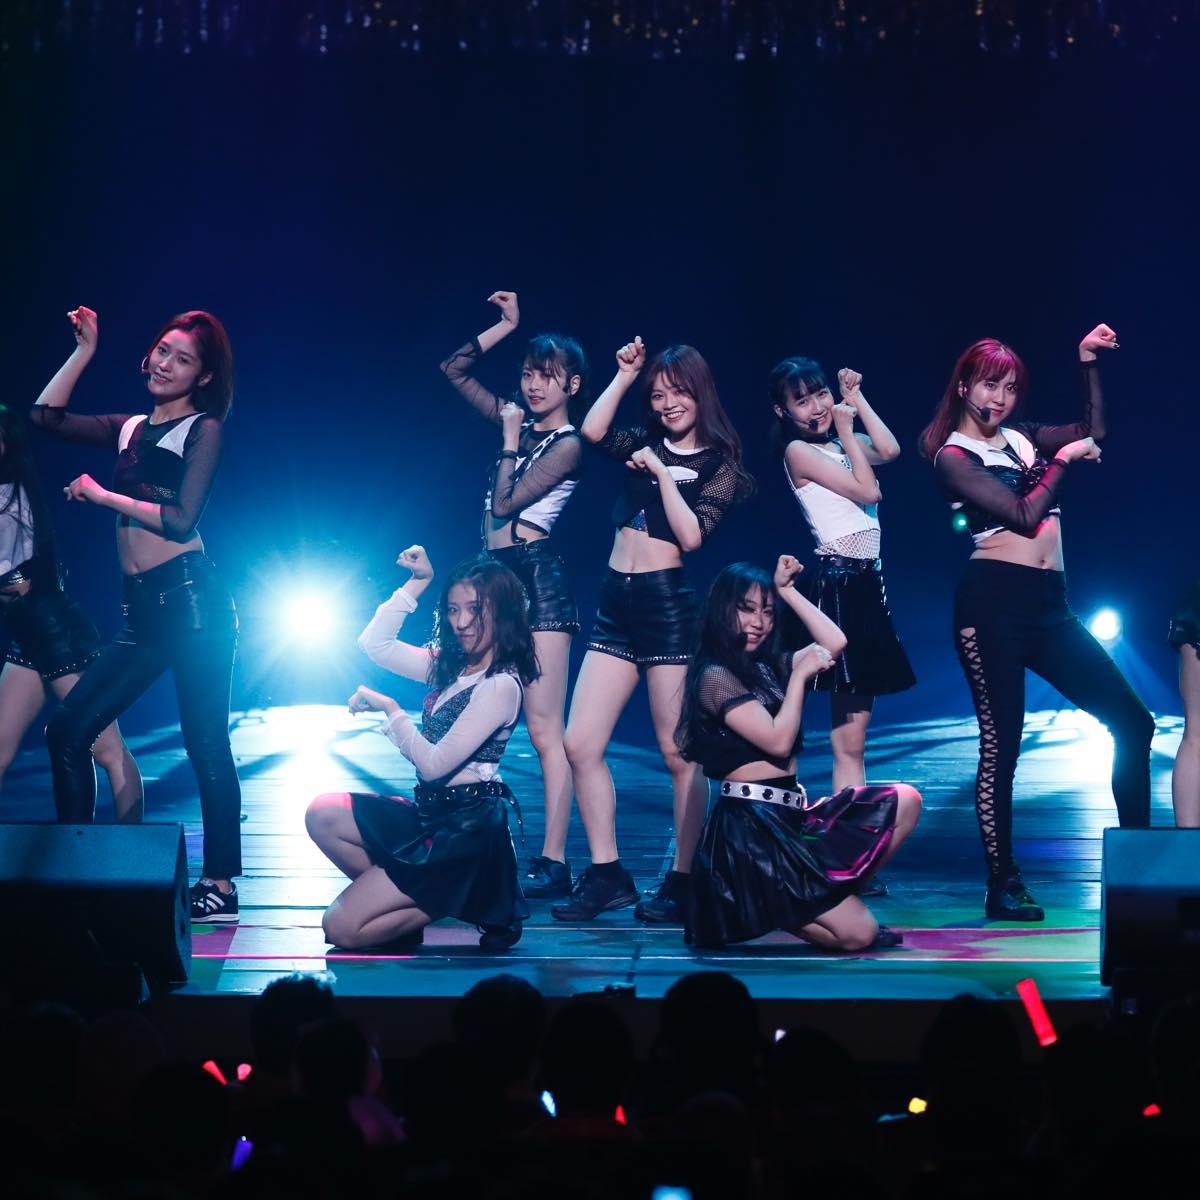 HKT48が8周年前夜祭コンサート「8周年だよ!HKT48の令和に昭和な歌合戦~みんなで笑おう八っ八っ八っ八っ八っ八っ八っ八っ(笑)~」を開催!の画像008